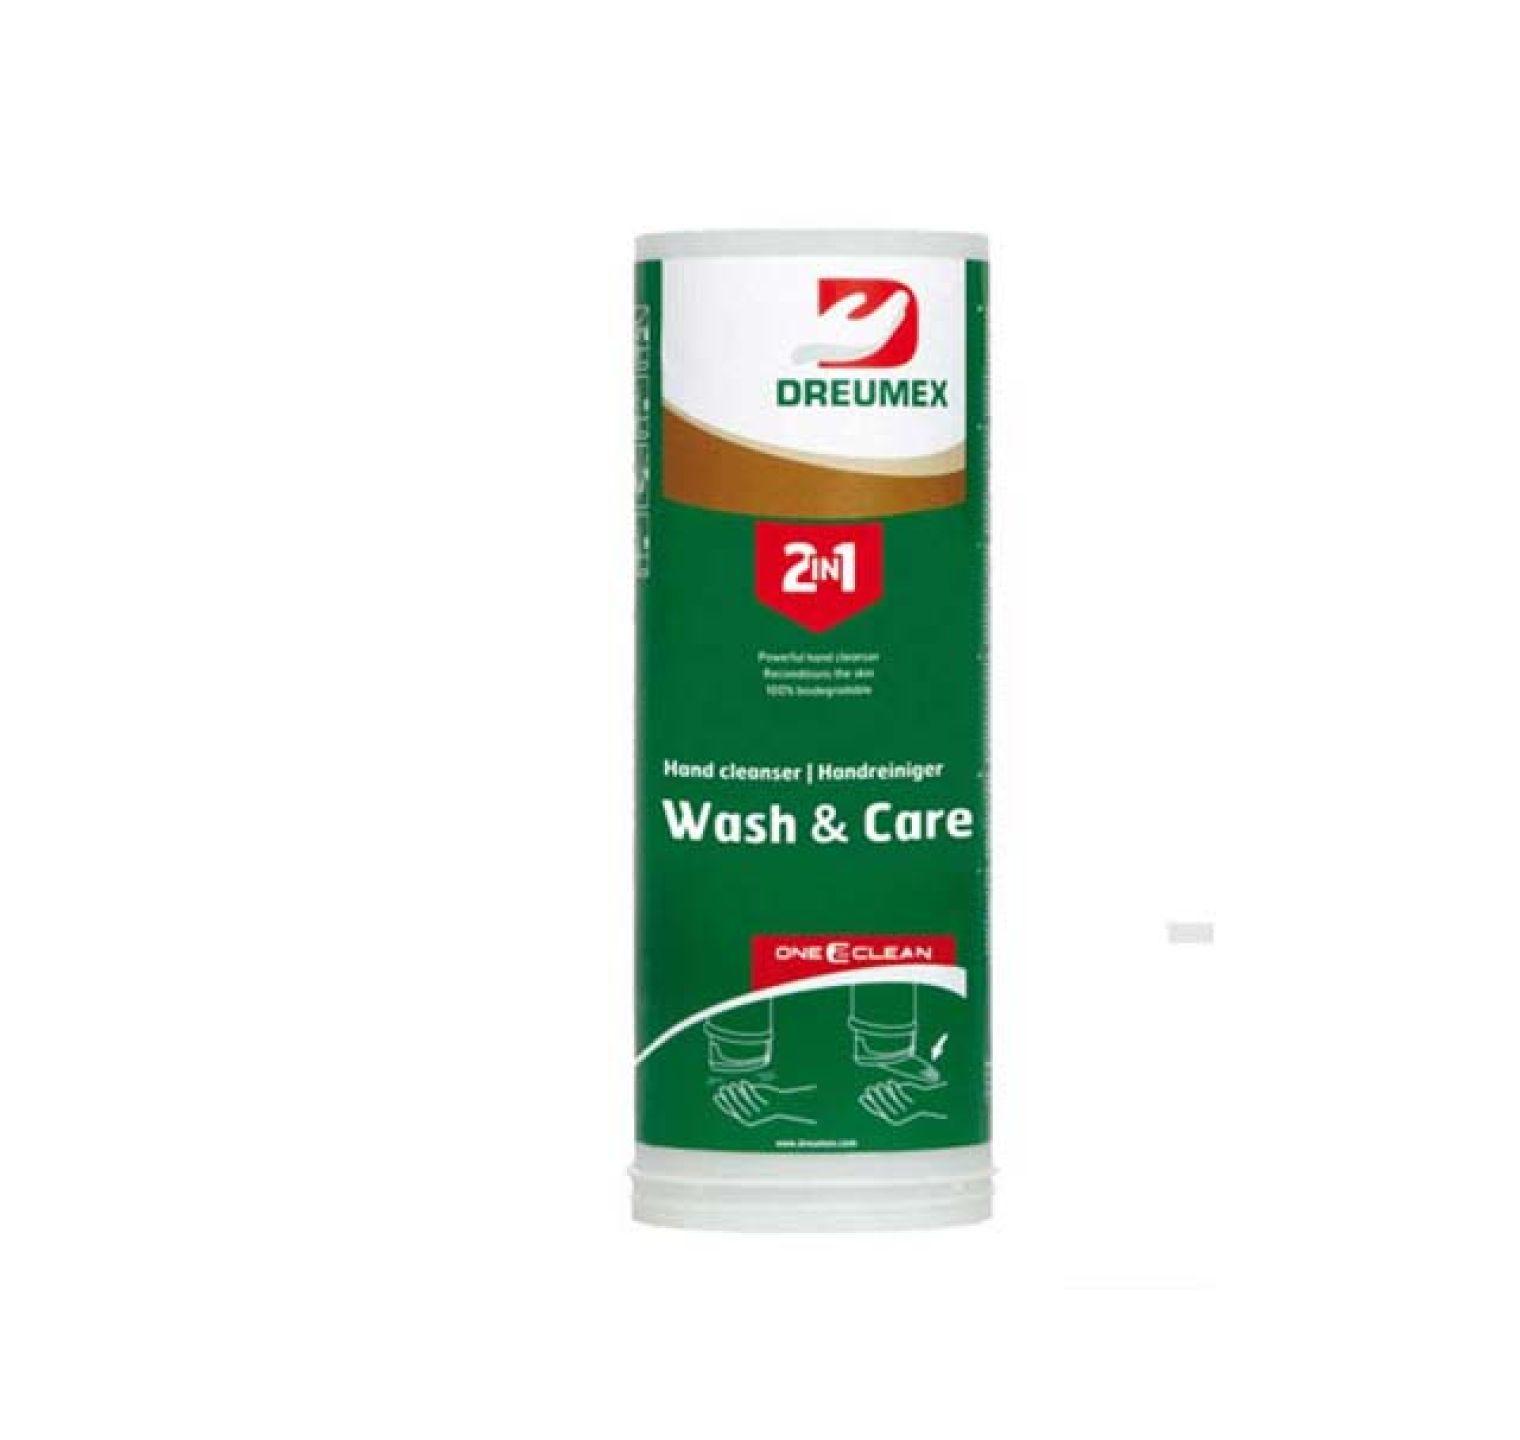 Dreumex One2clean Wash & Care 3l